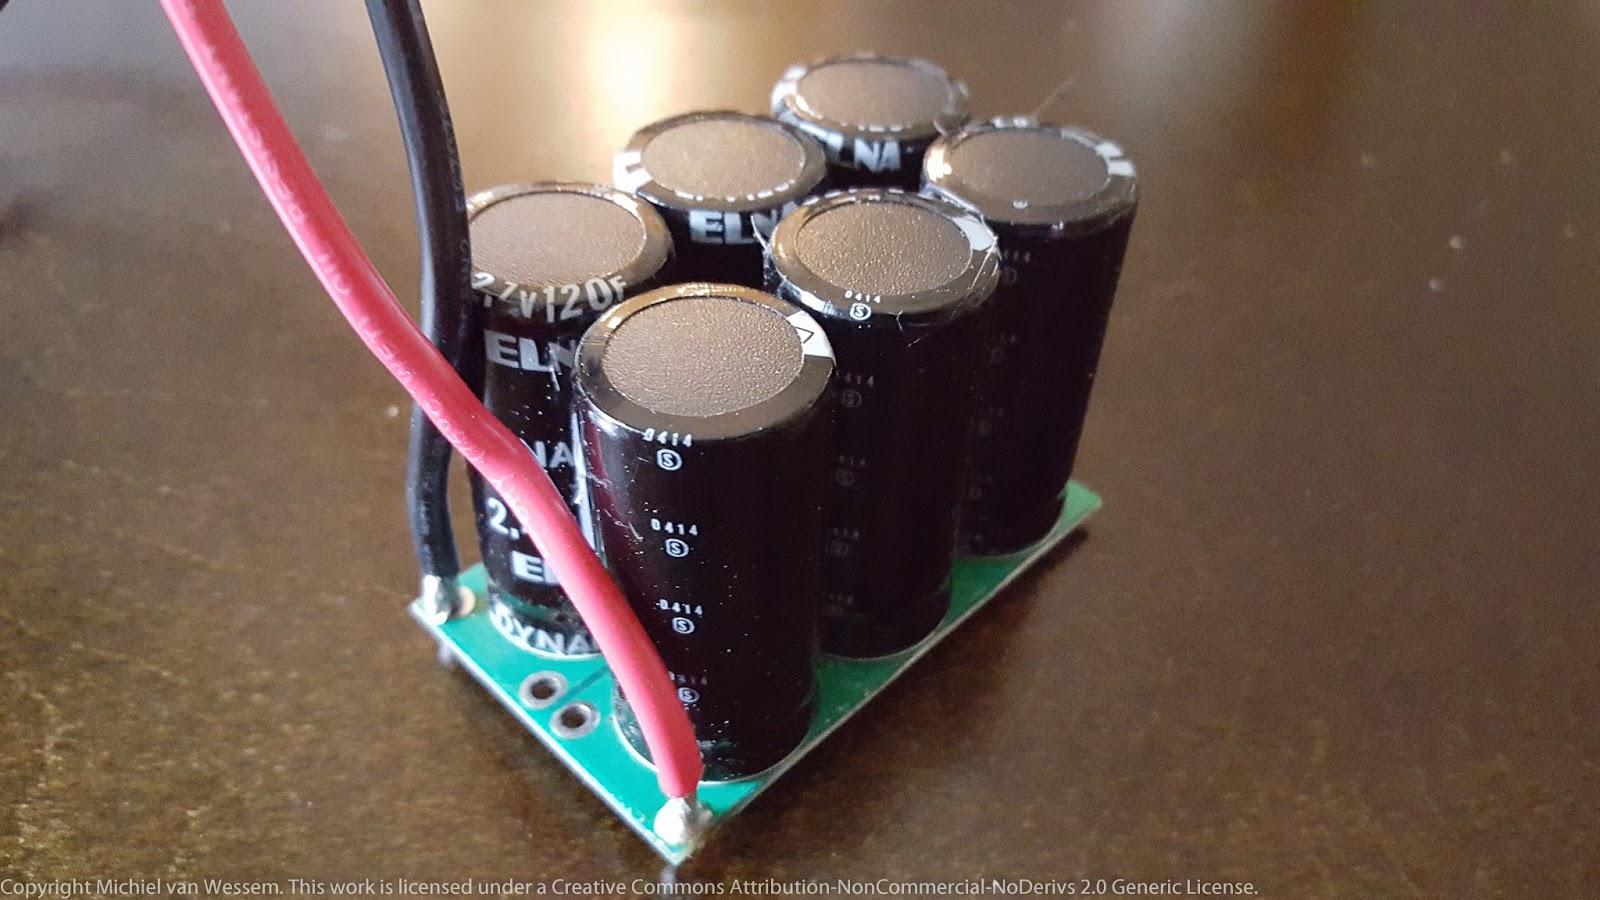 Puny Projects: 20 Farad, 16 2 volt supercapacitor bank